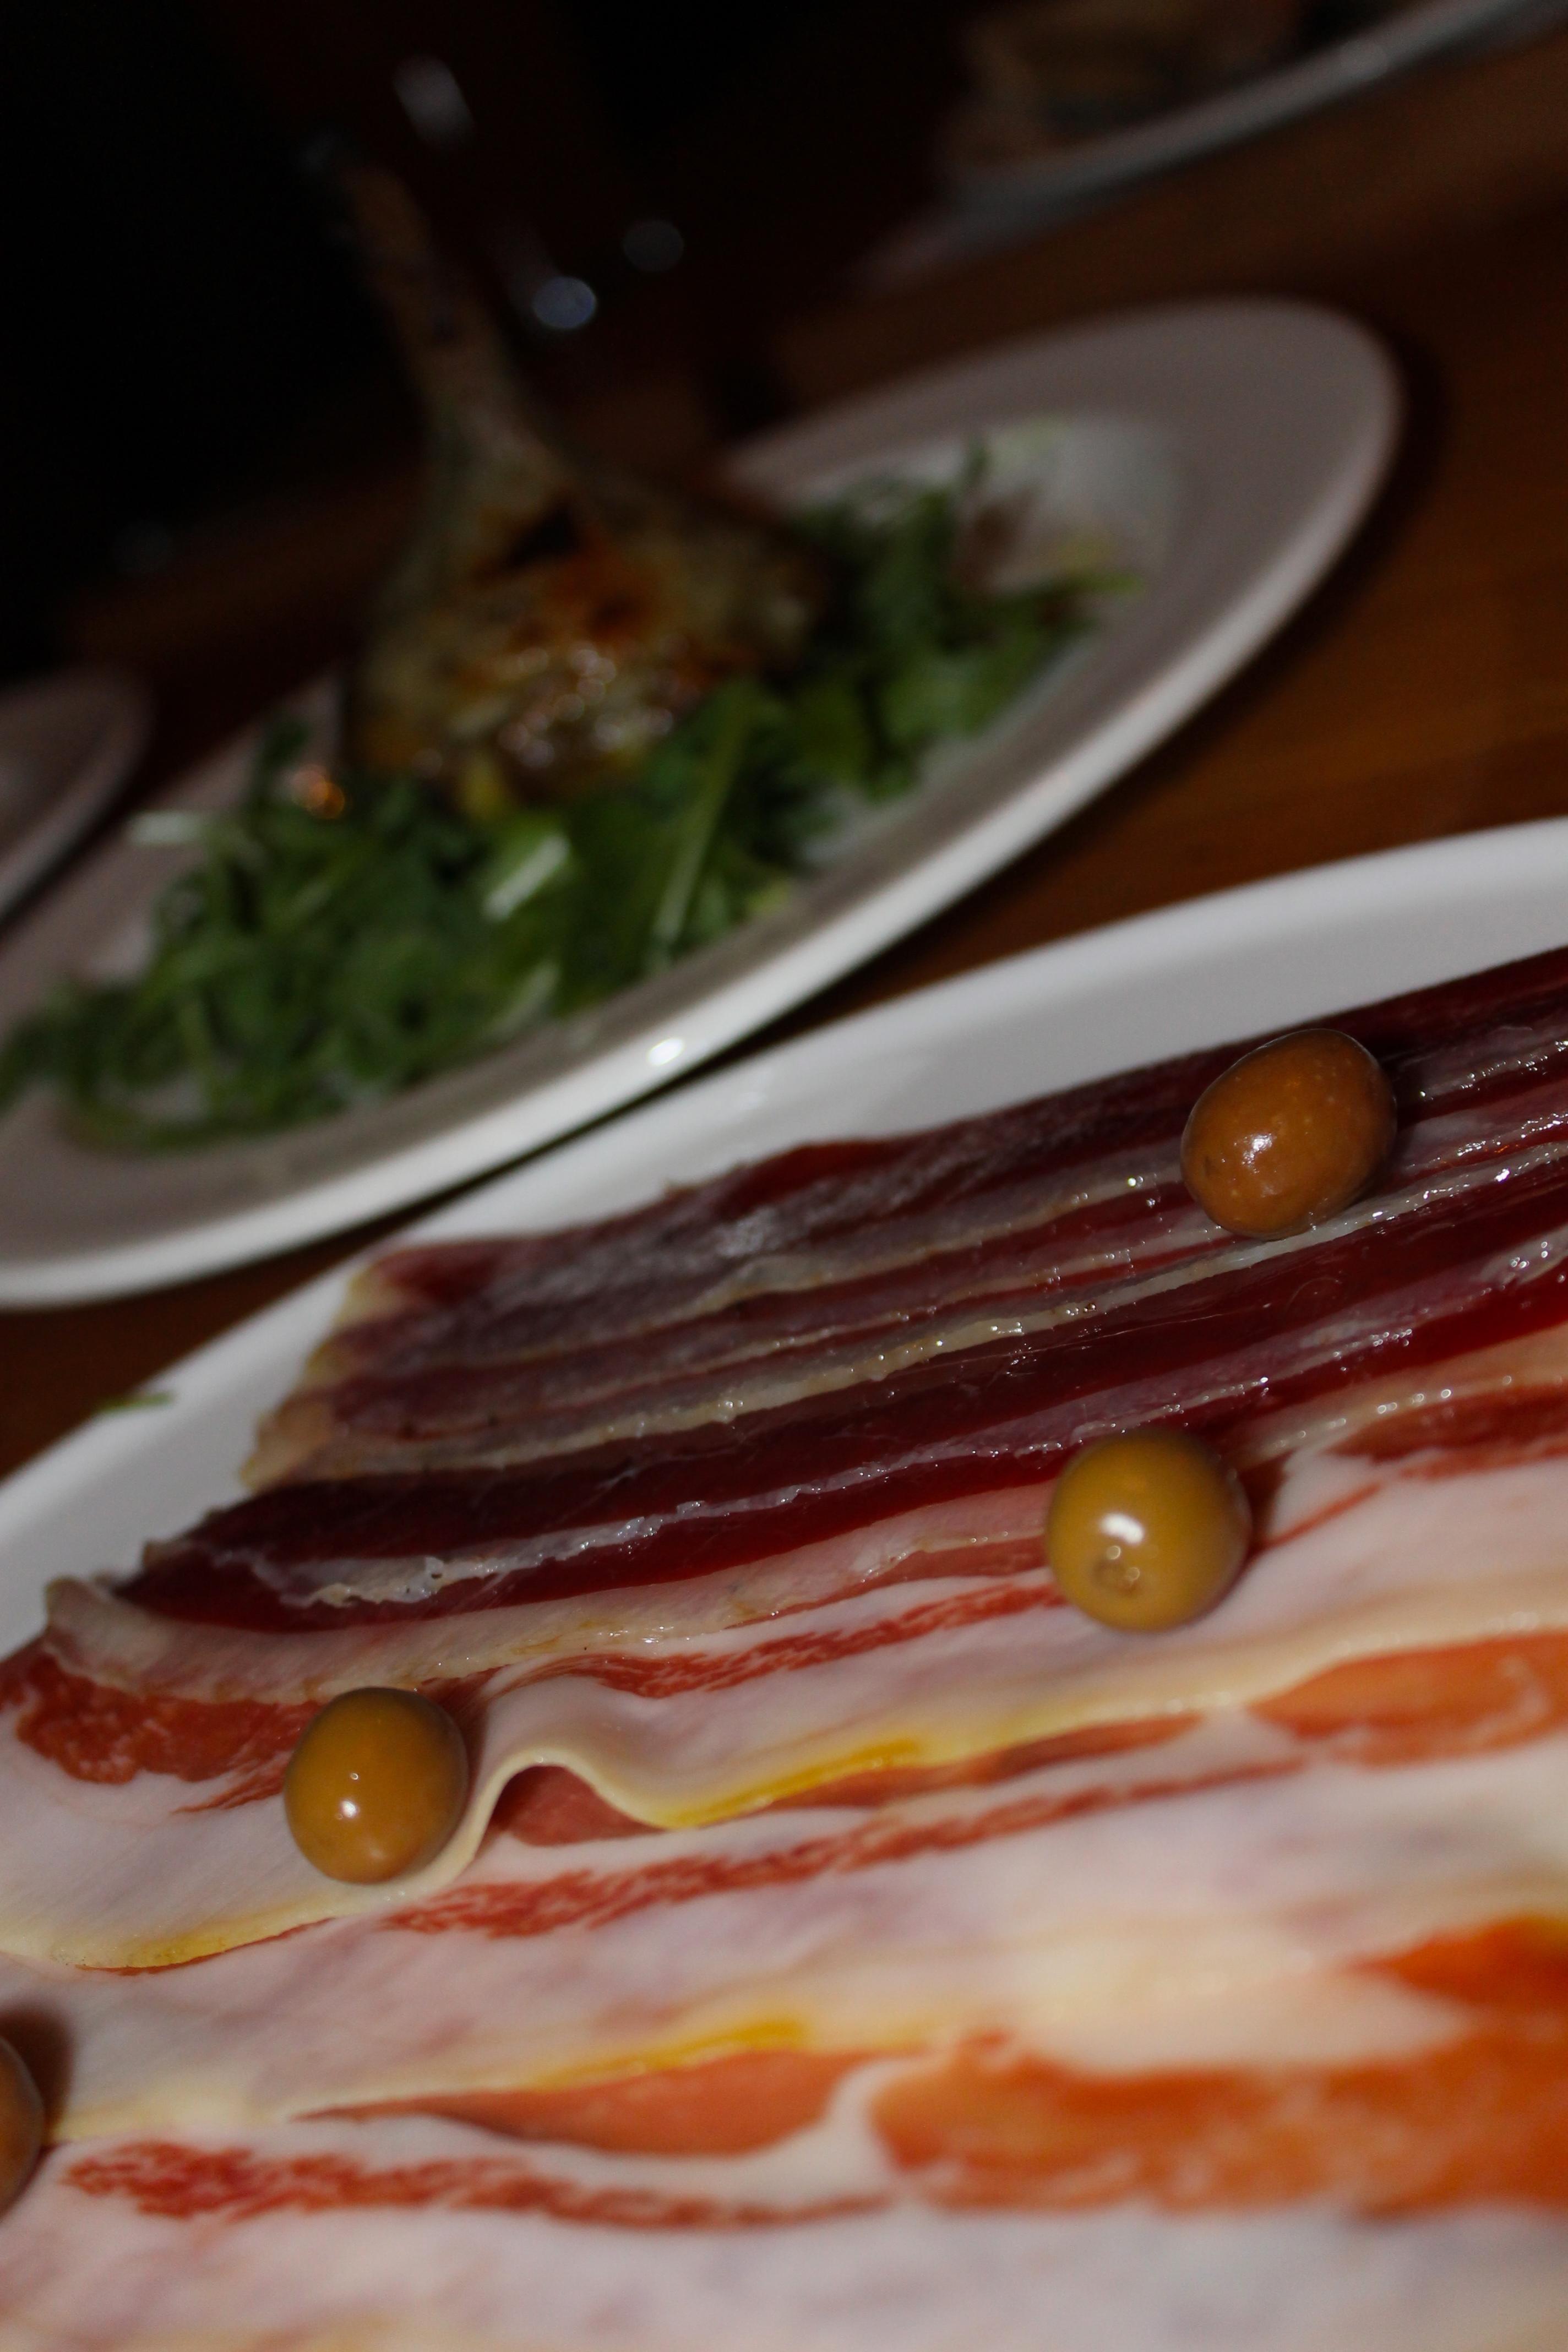 Three kinds of fancy ham and a stuffed artichoke.